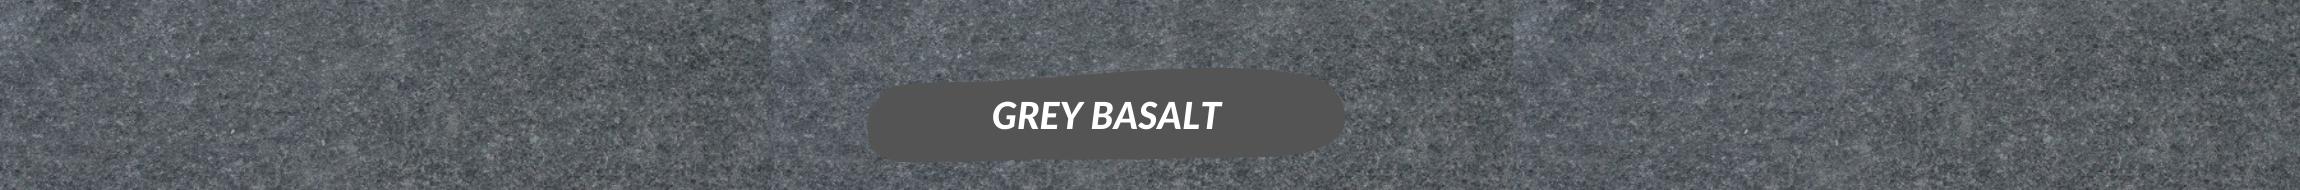 grey-basalt-andesite